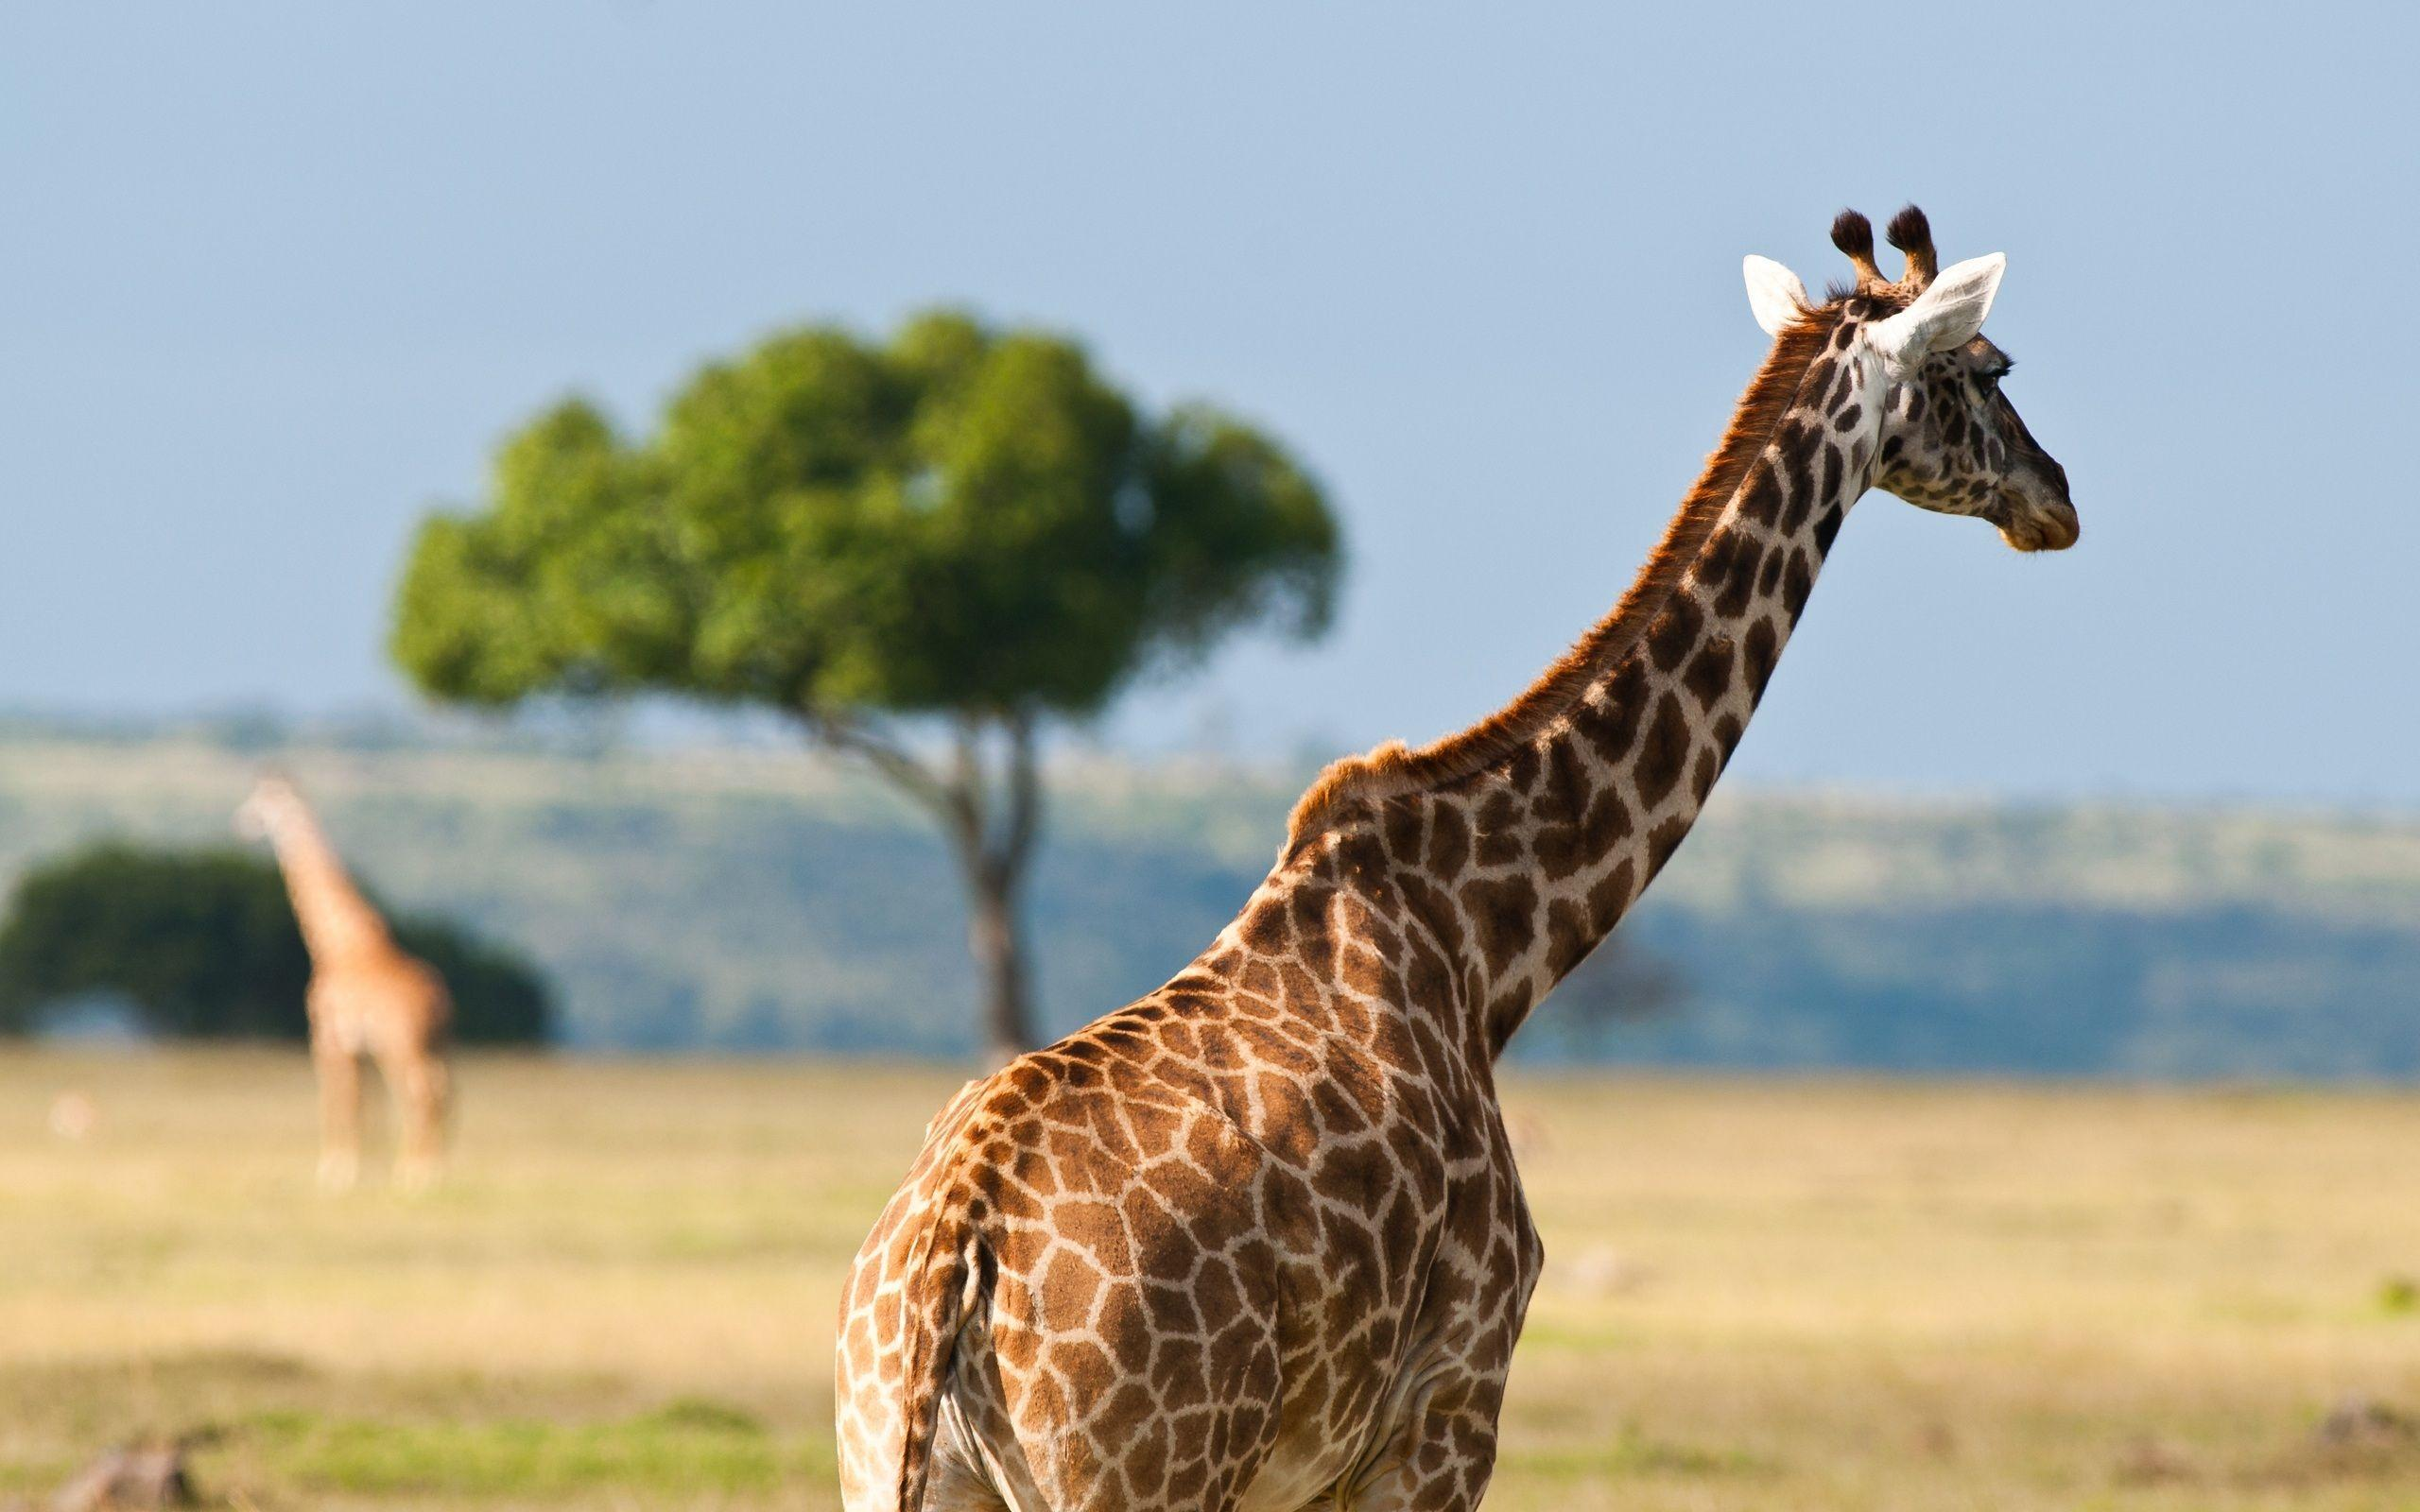 Giraffe In The Safari - Wallpapers AM